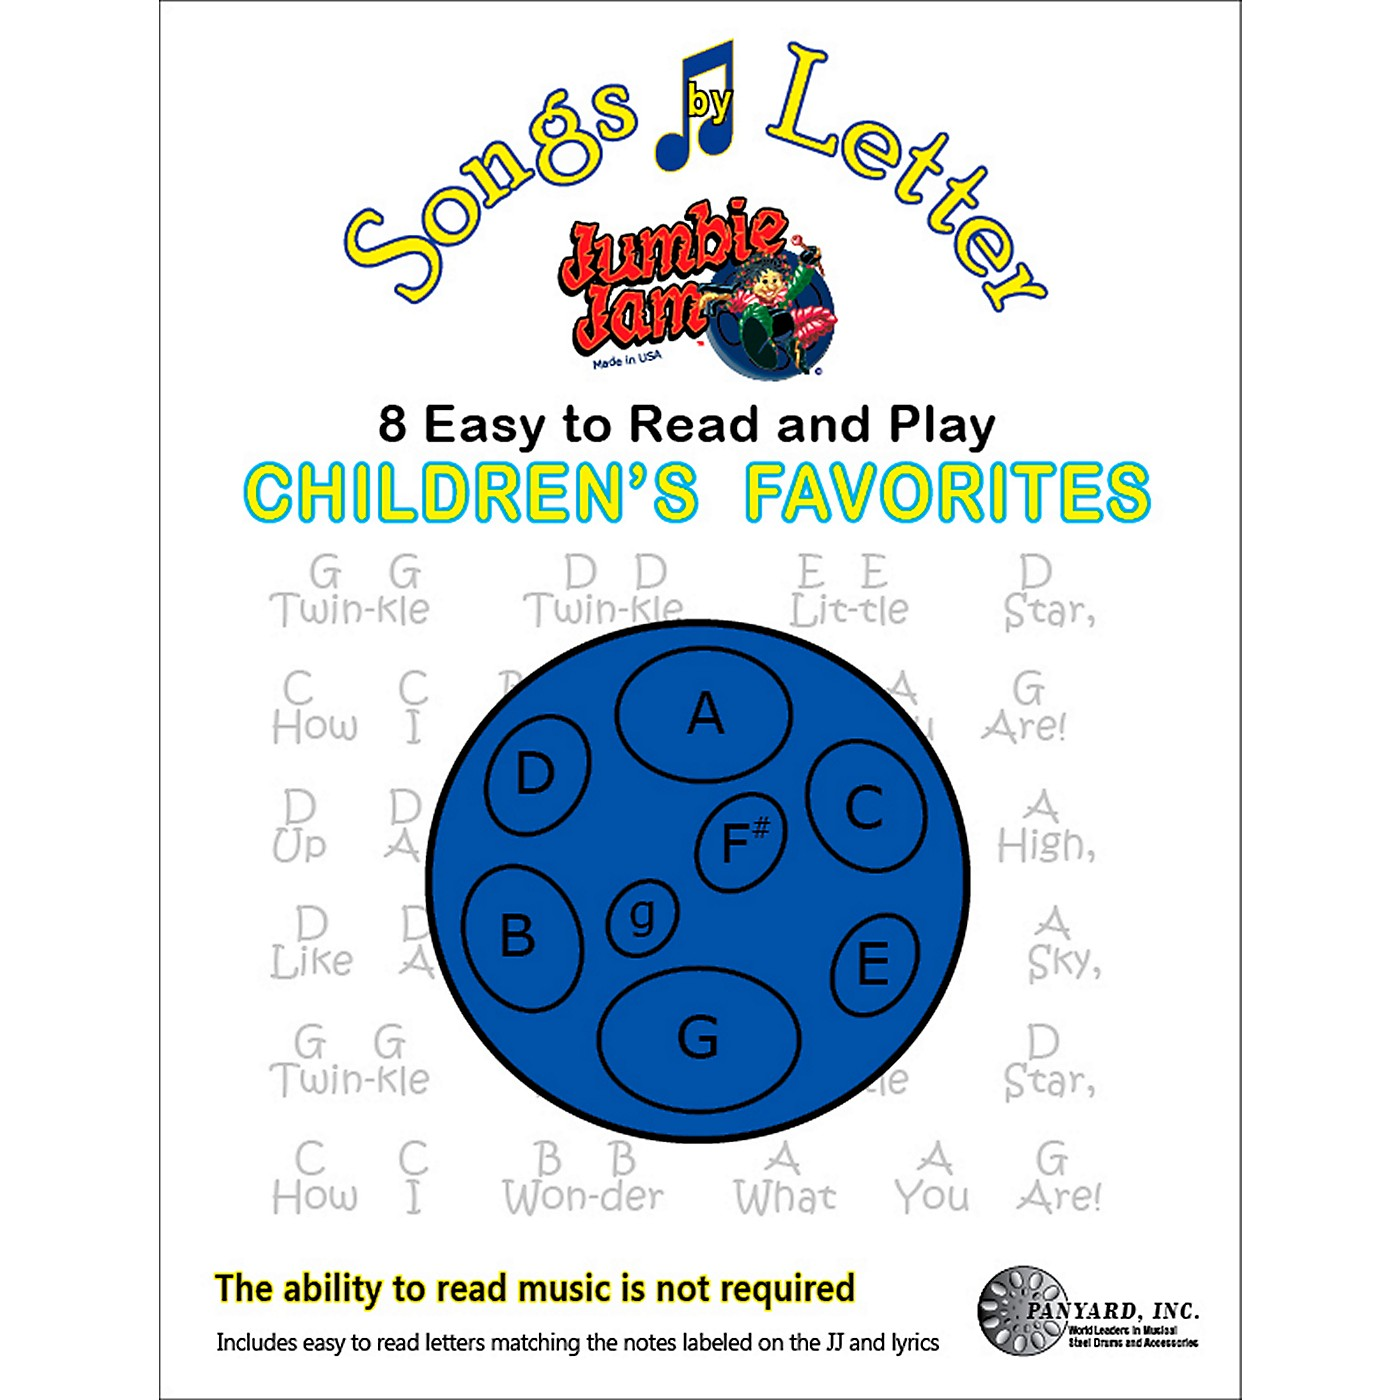 Panyard Jumbie Jam Songs by Letter Song Book - Childrens thumbnail